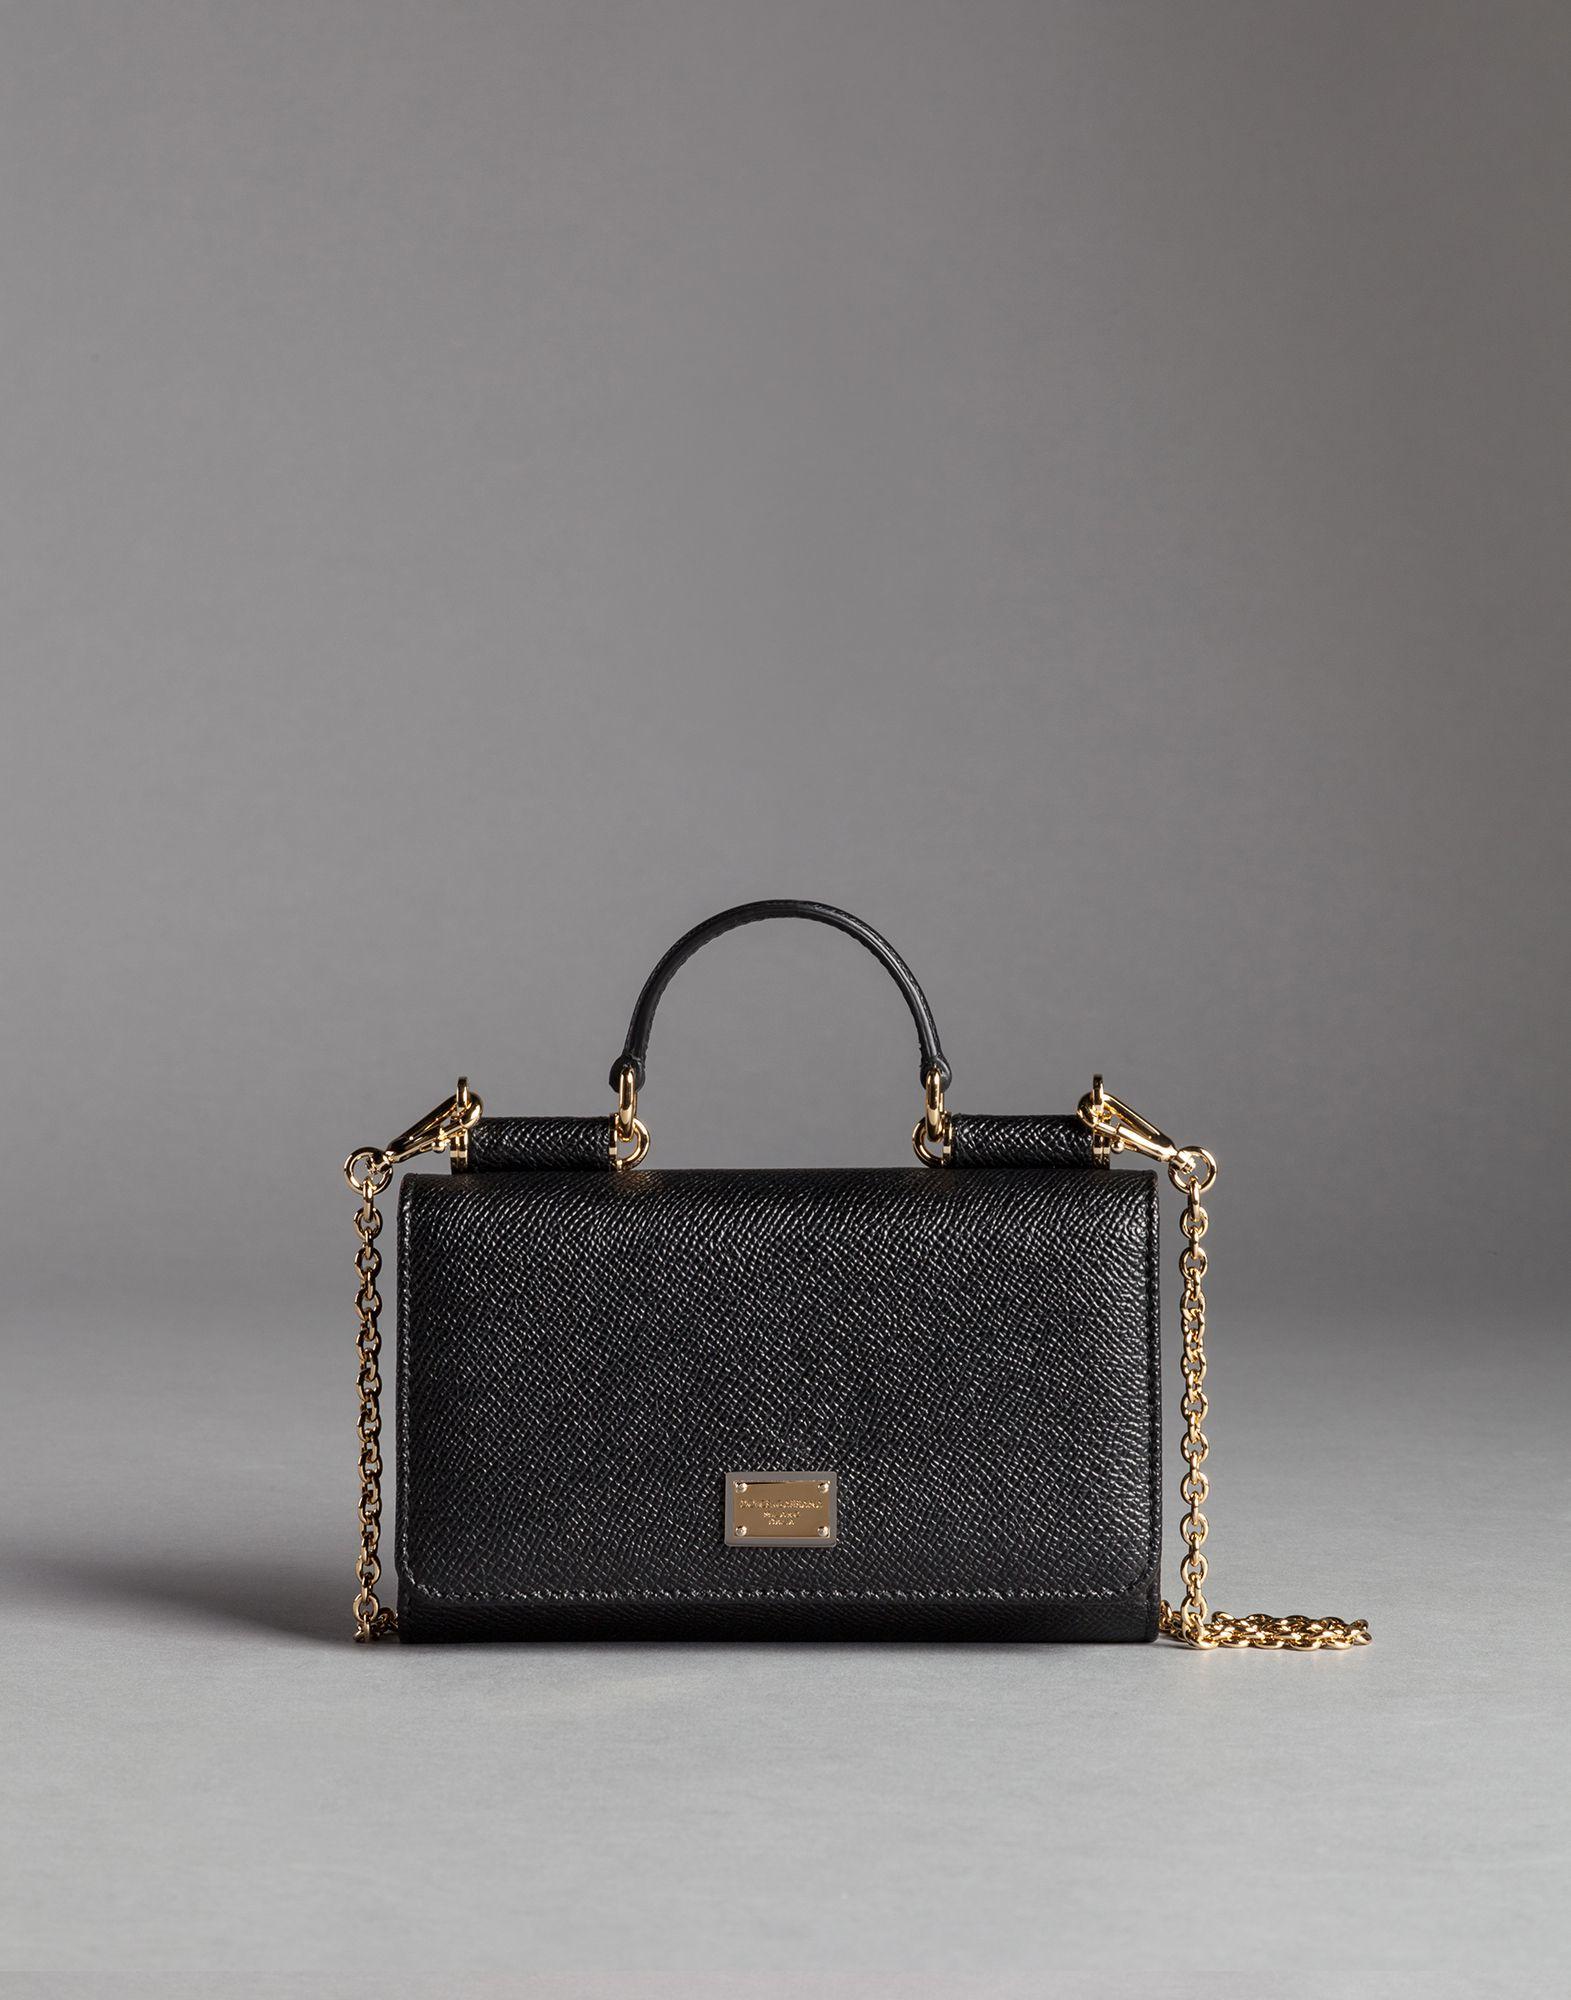 Dolce   Gabbana Mini Von Bag In Dauphine Print Leather in Black - Lyst 31458f46b6620